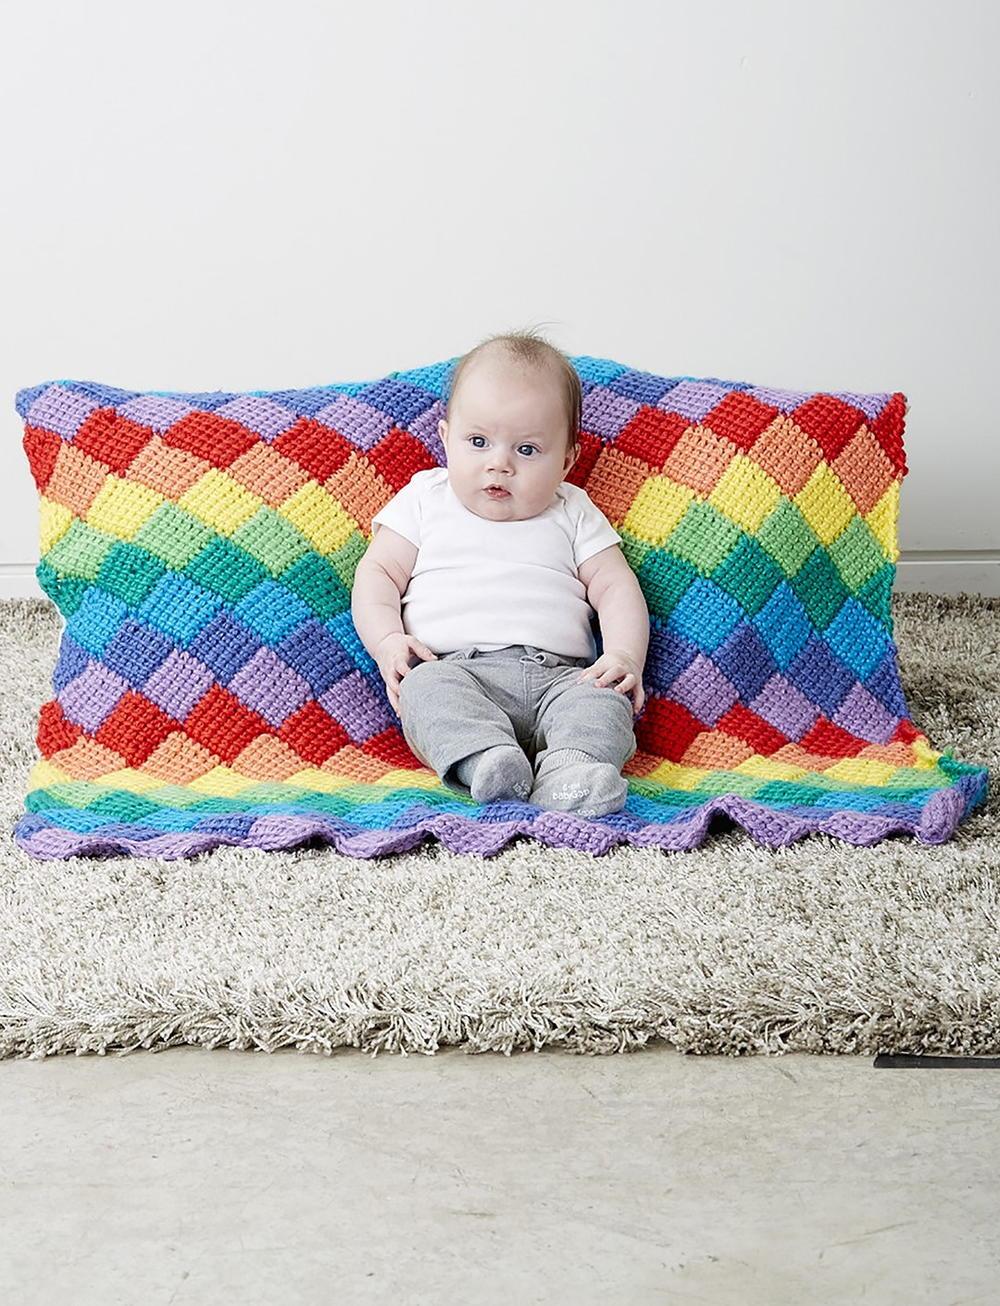 Rainbow Tunisian Entrelac Crochet Baby Blanket Pattern Allfreecrochet Com